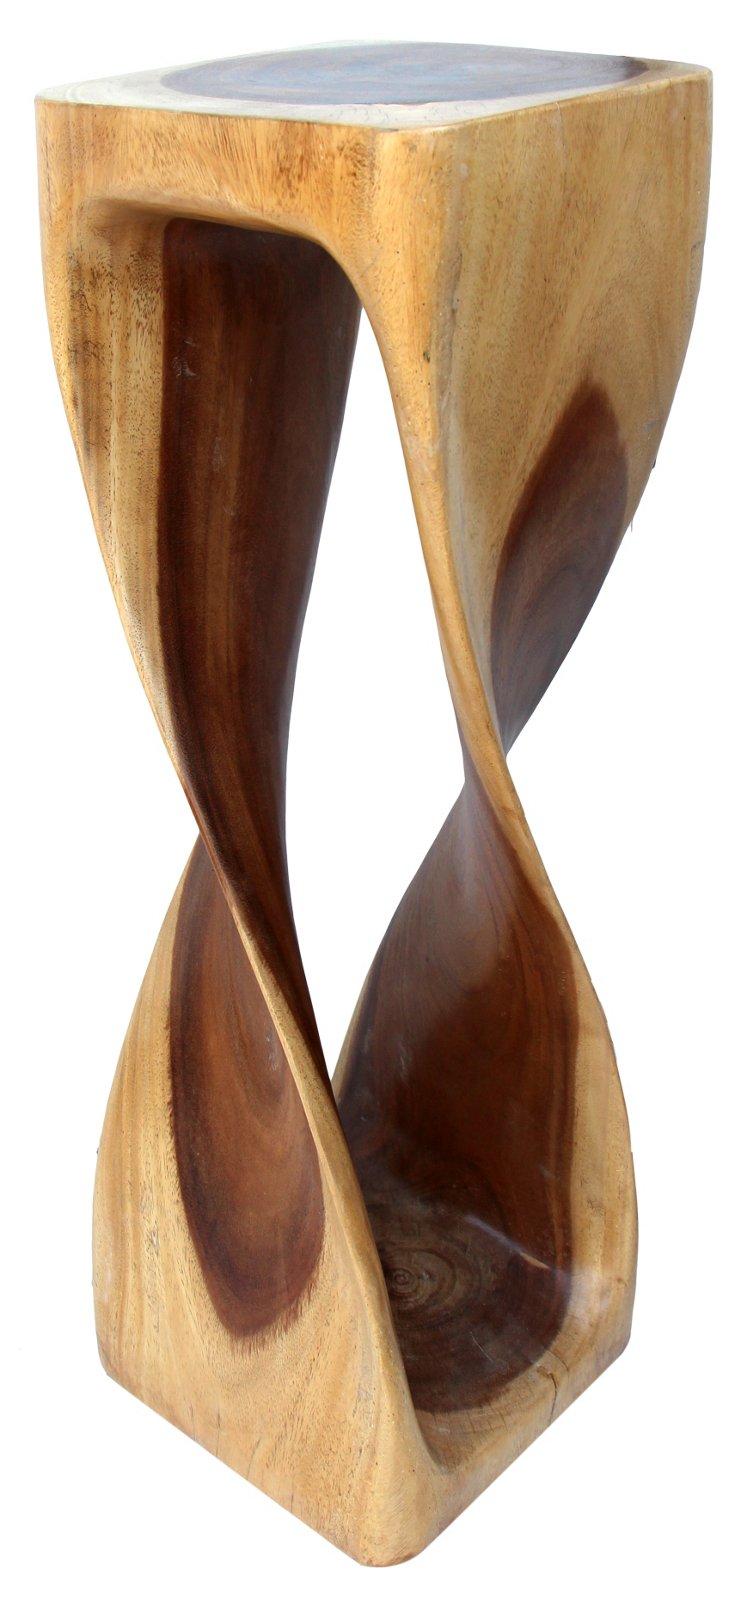 Estelle Mango Wood Stool, Natural